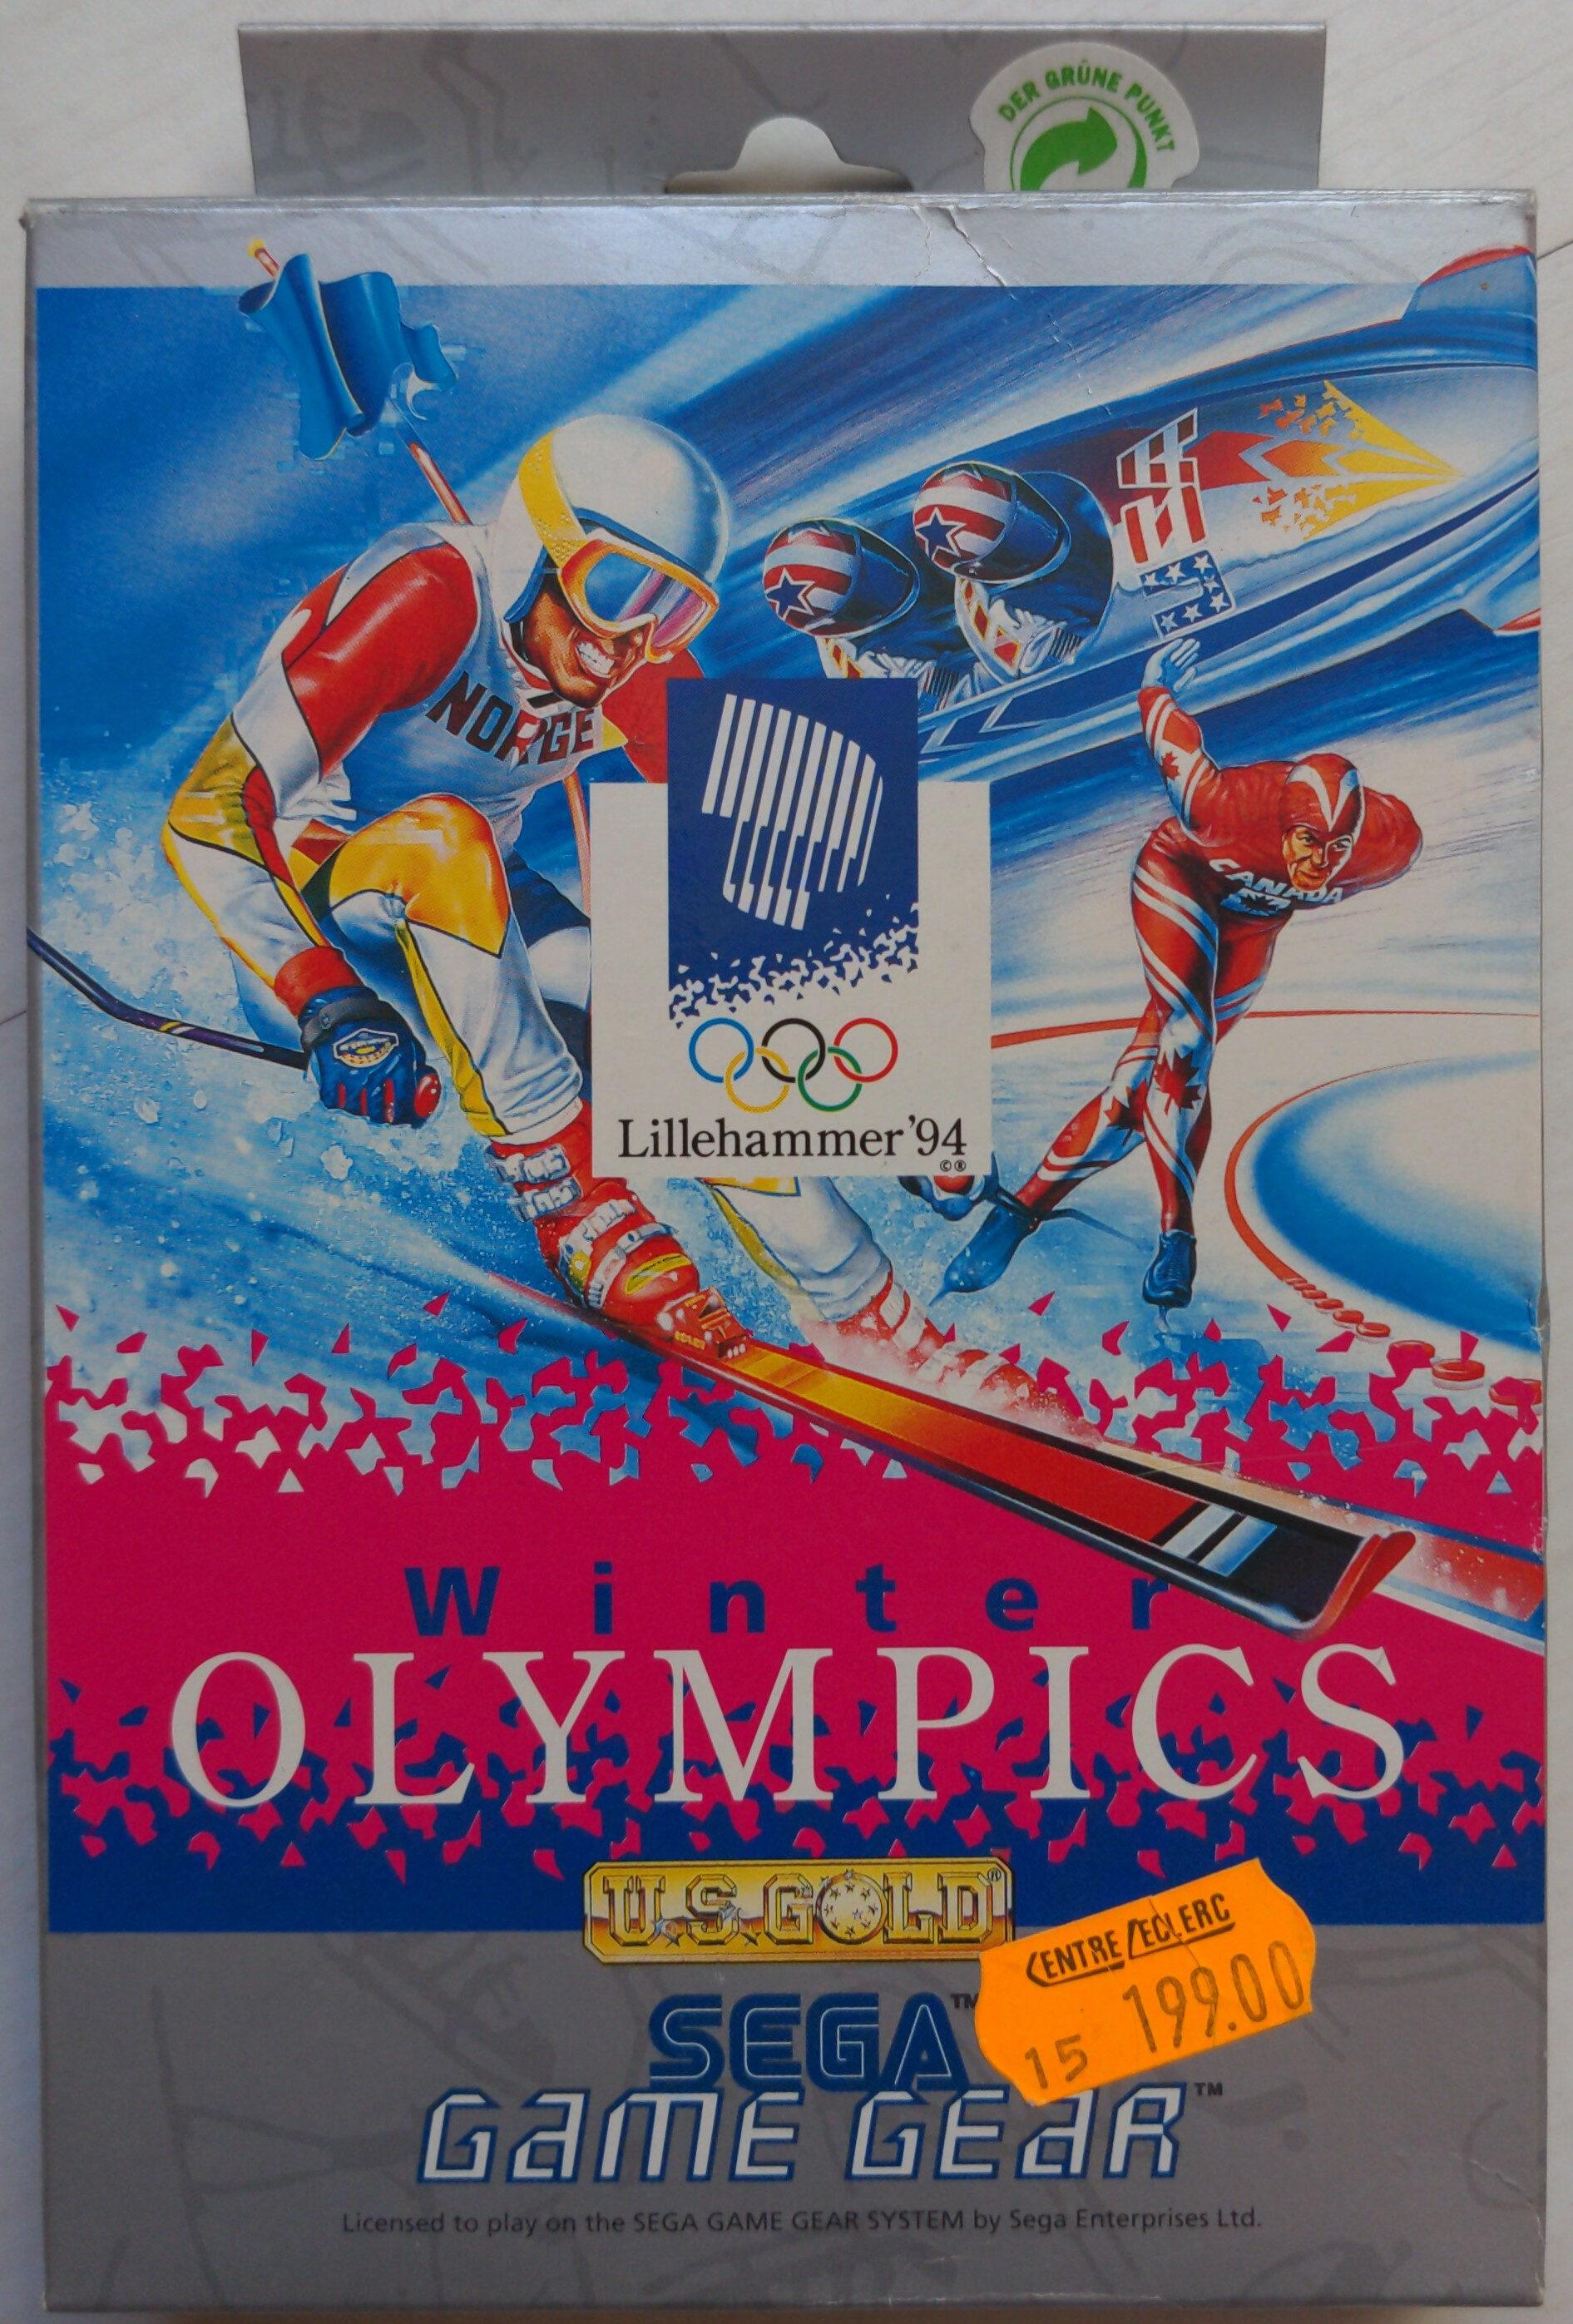 Lillehammer'94 Winter Olympics - Produit - en